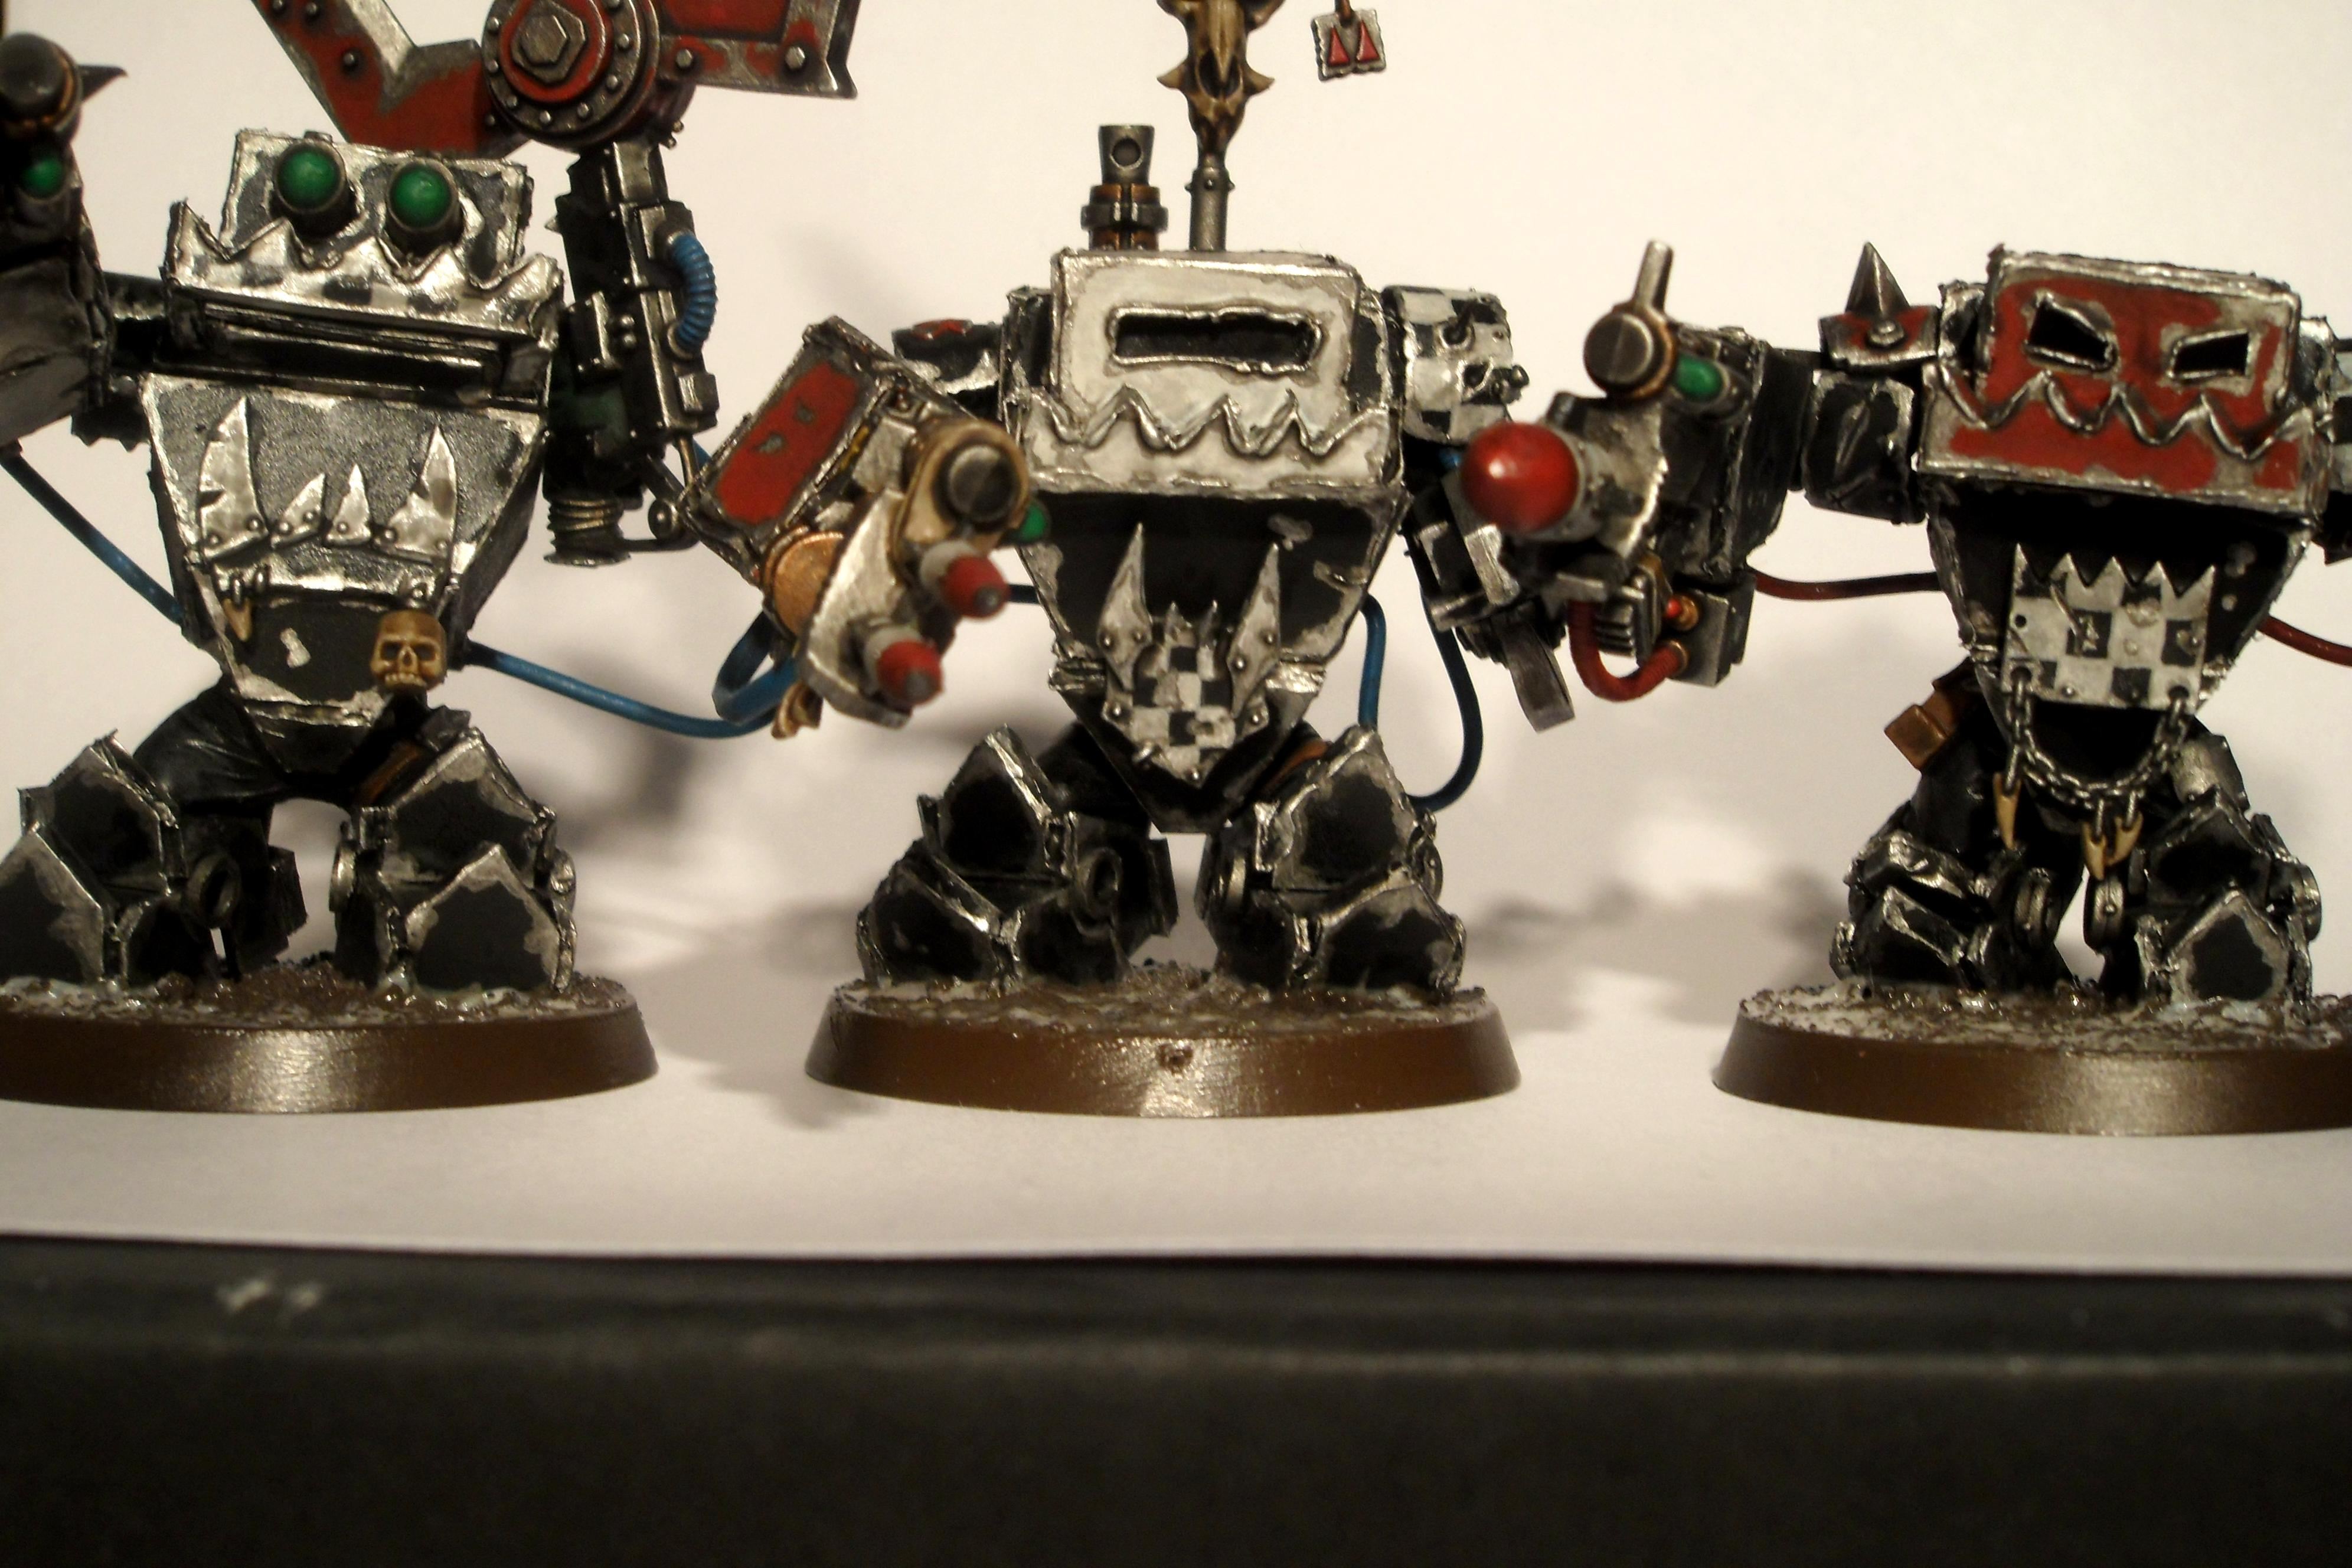 Battlewagon, Conversion, Mega Nobz, Orks, Warhammer 40,000, Weirdboy